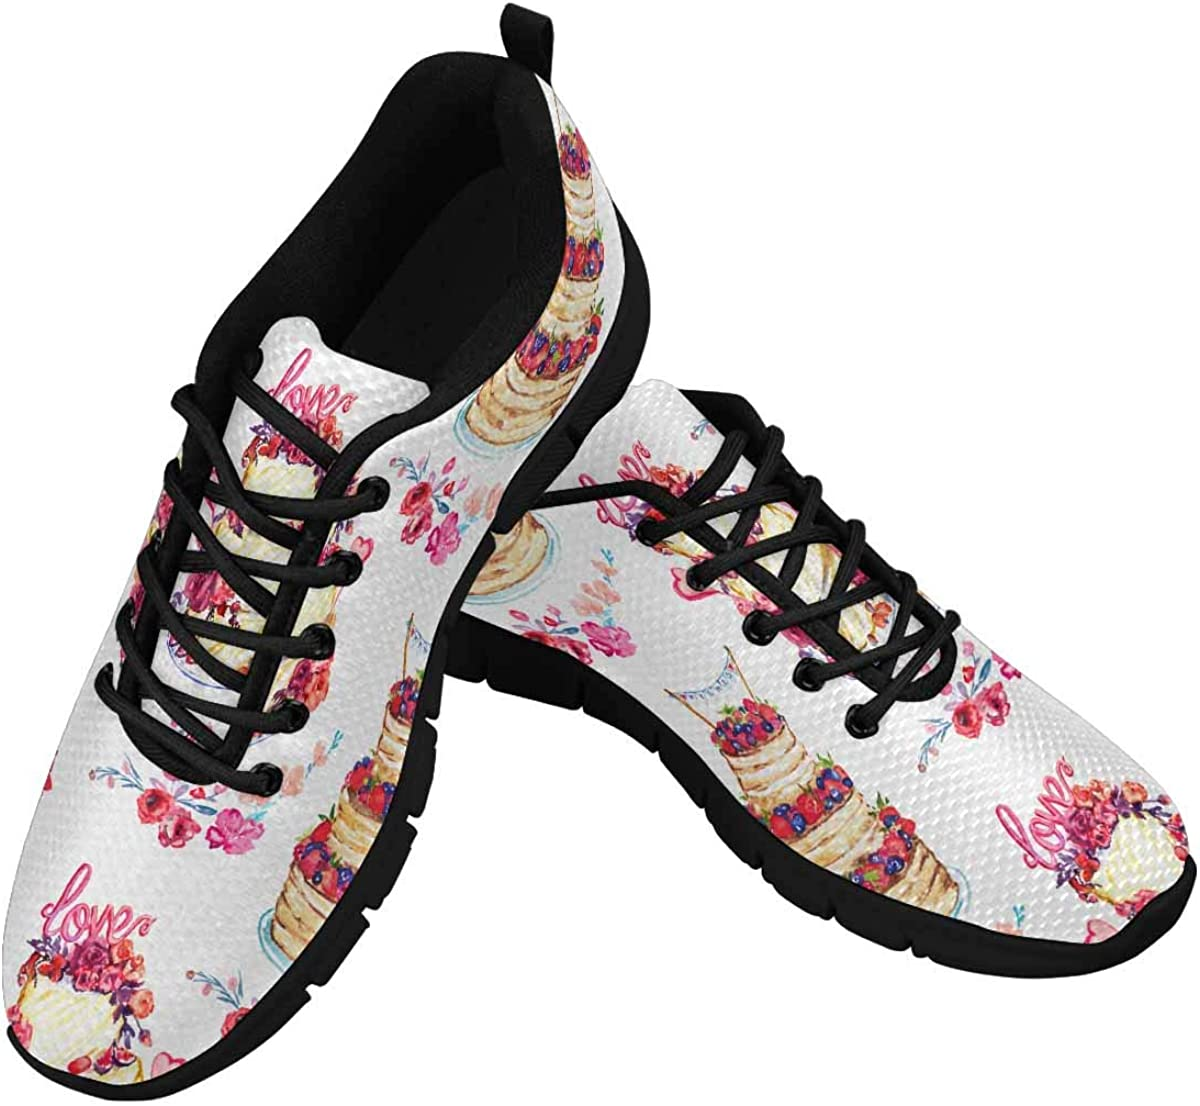 INTERESTPRINT Happy Birthday Women's Lace Up Running Comfort Sports Sneakers